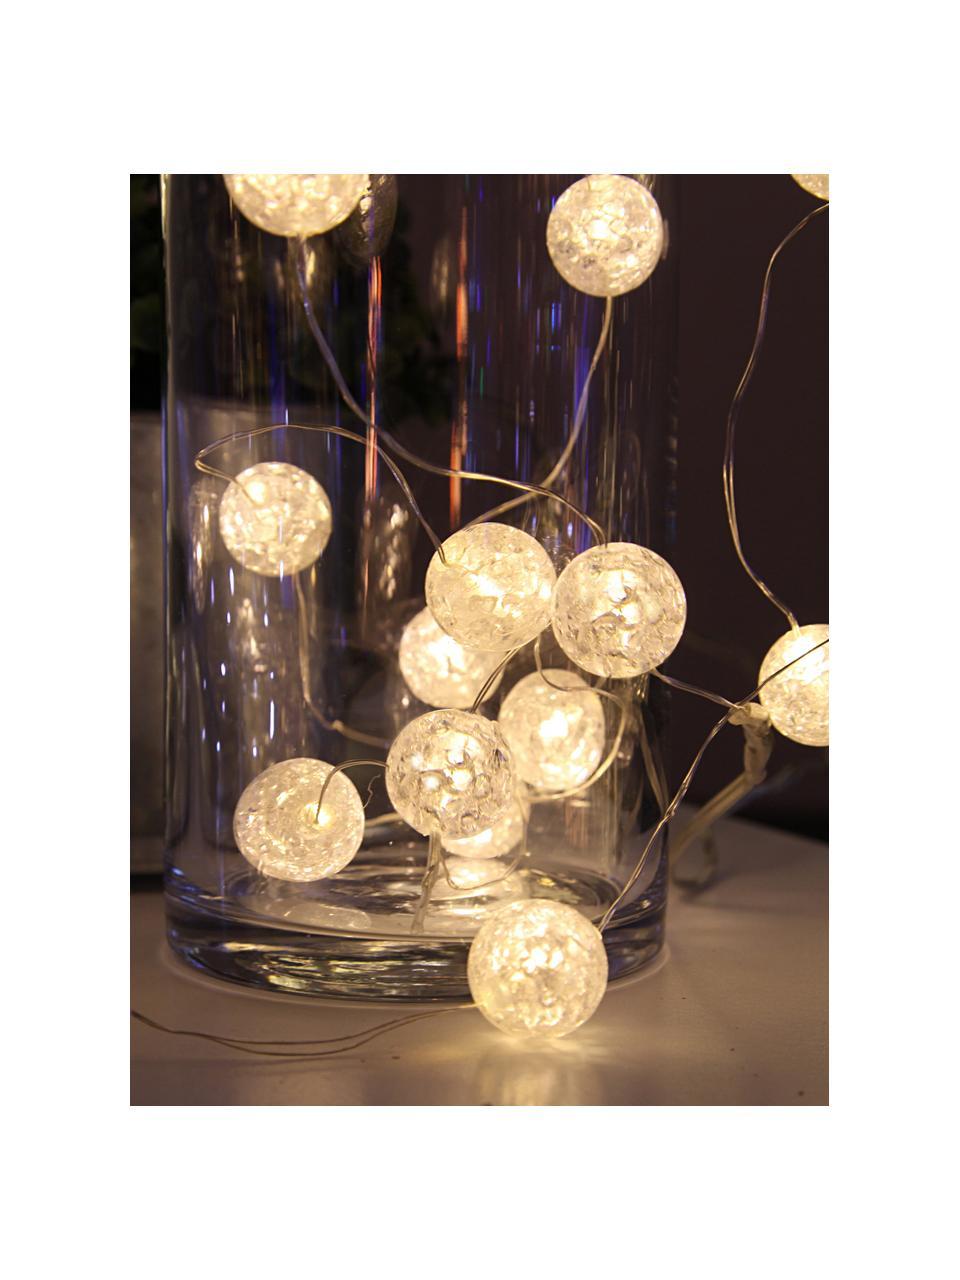 LED-Lichterkette Raindrop, 140 cm, Kunststoff, Weiß, L 140 cm